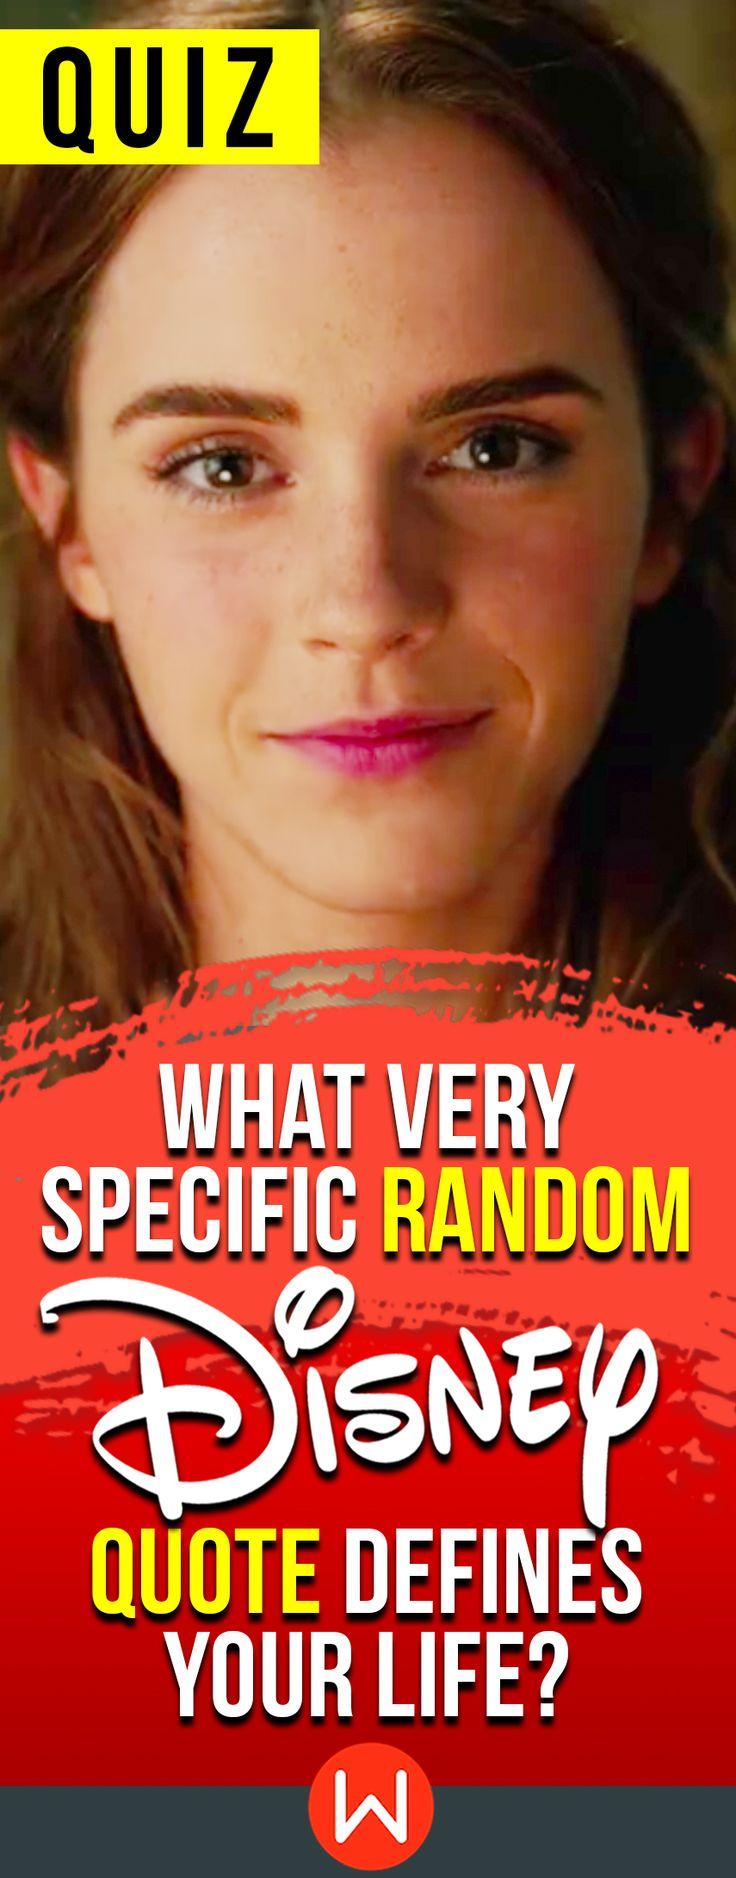 Quiz: What very specific random Disney quote defines your life? Disney Quiz, Personality test, Disney Personality quiz, Fun quiz, girl quiz, Beauty And the Beast, Quotes Quiz.